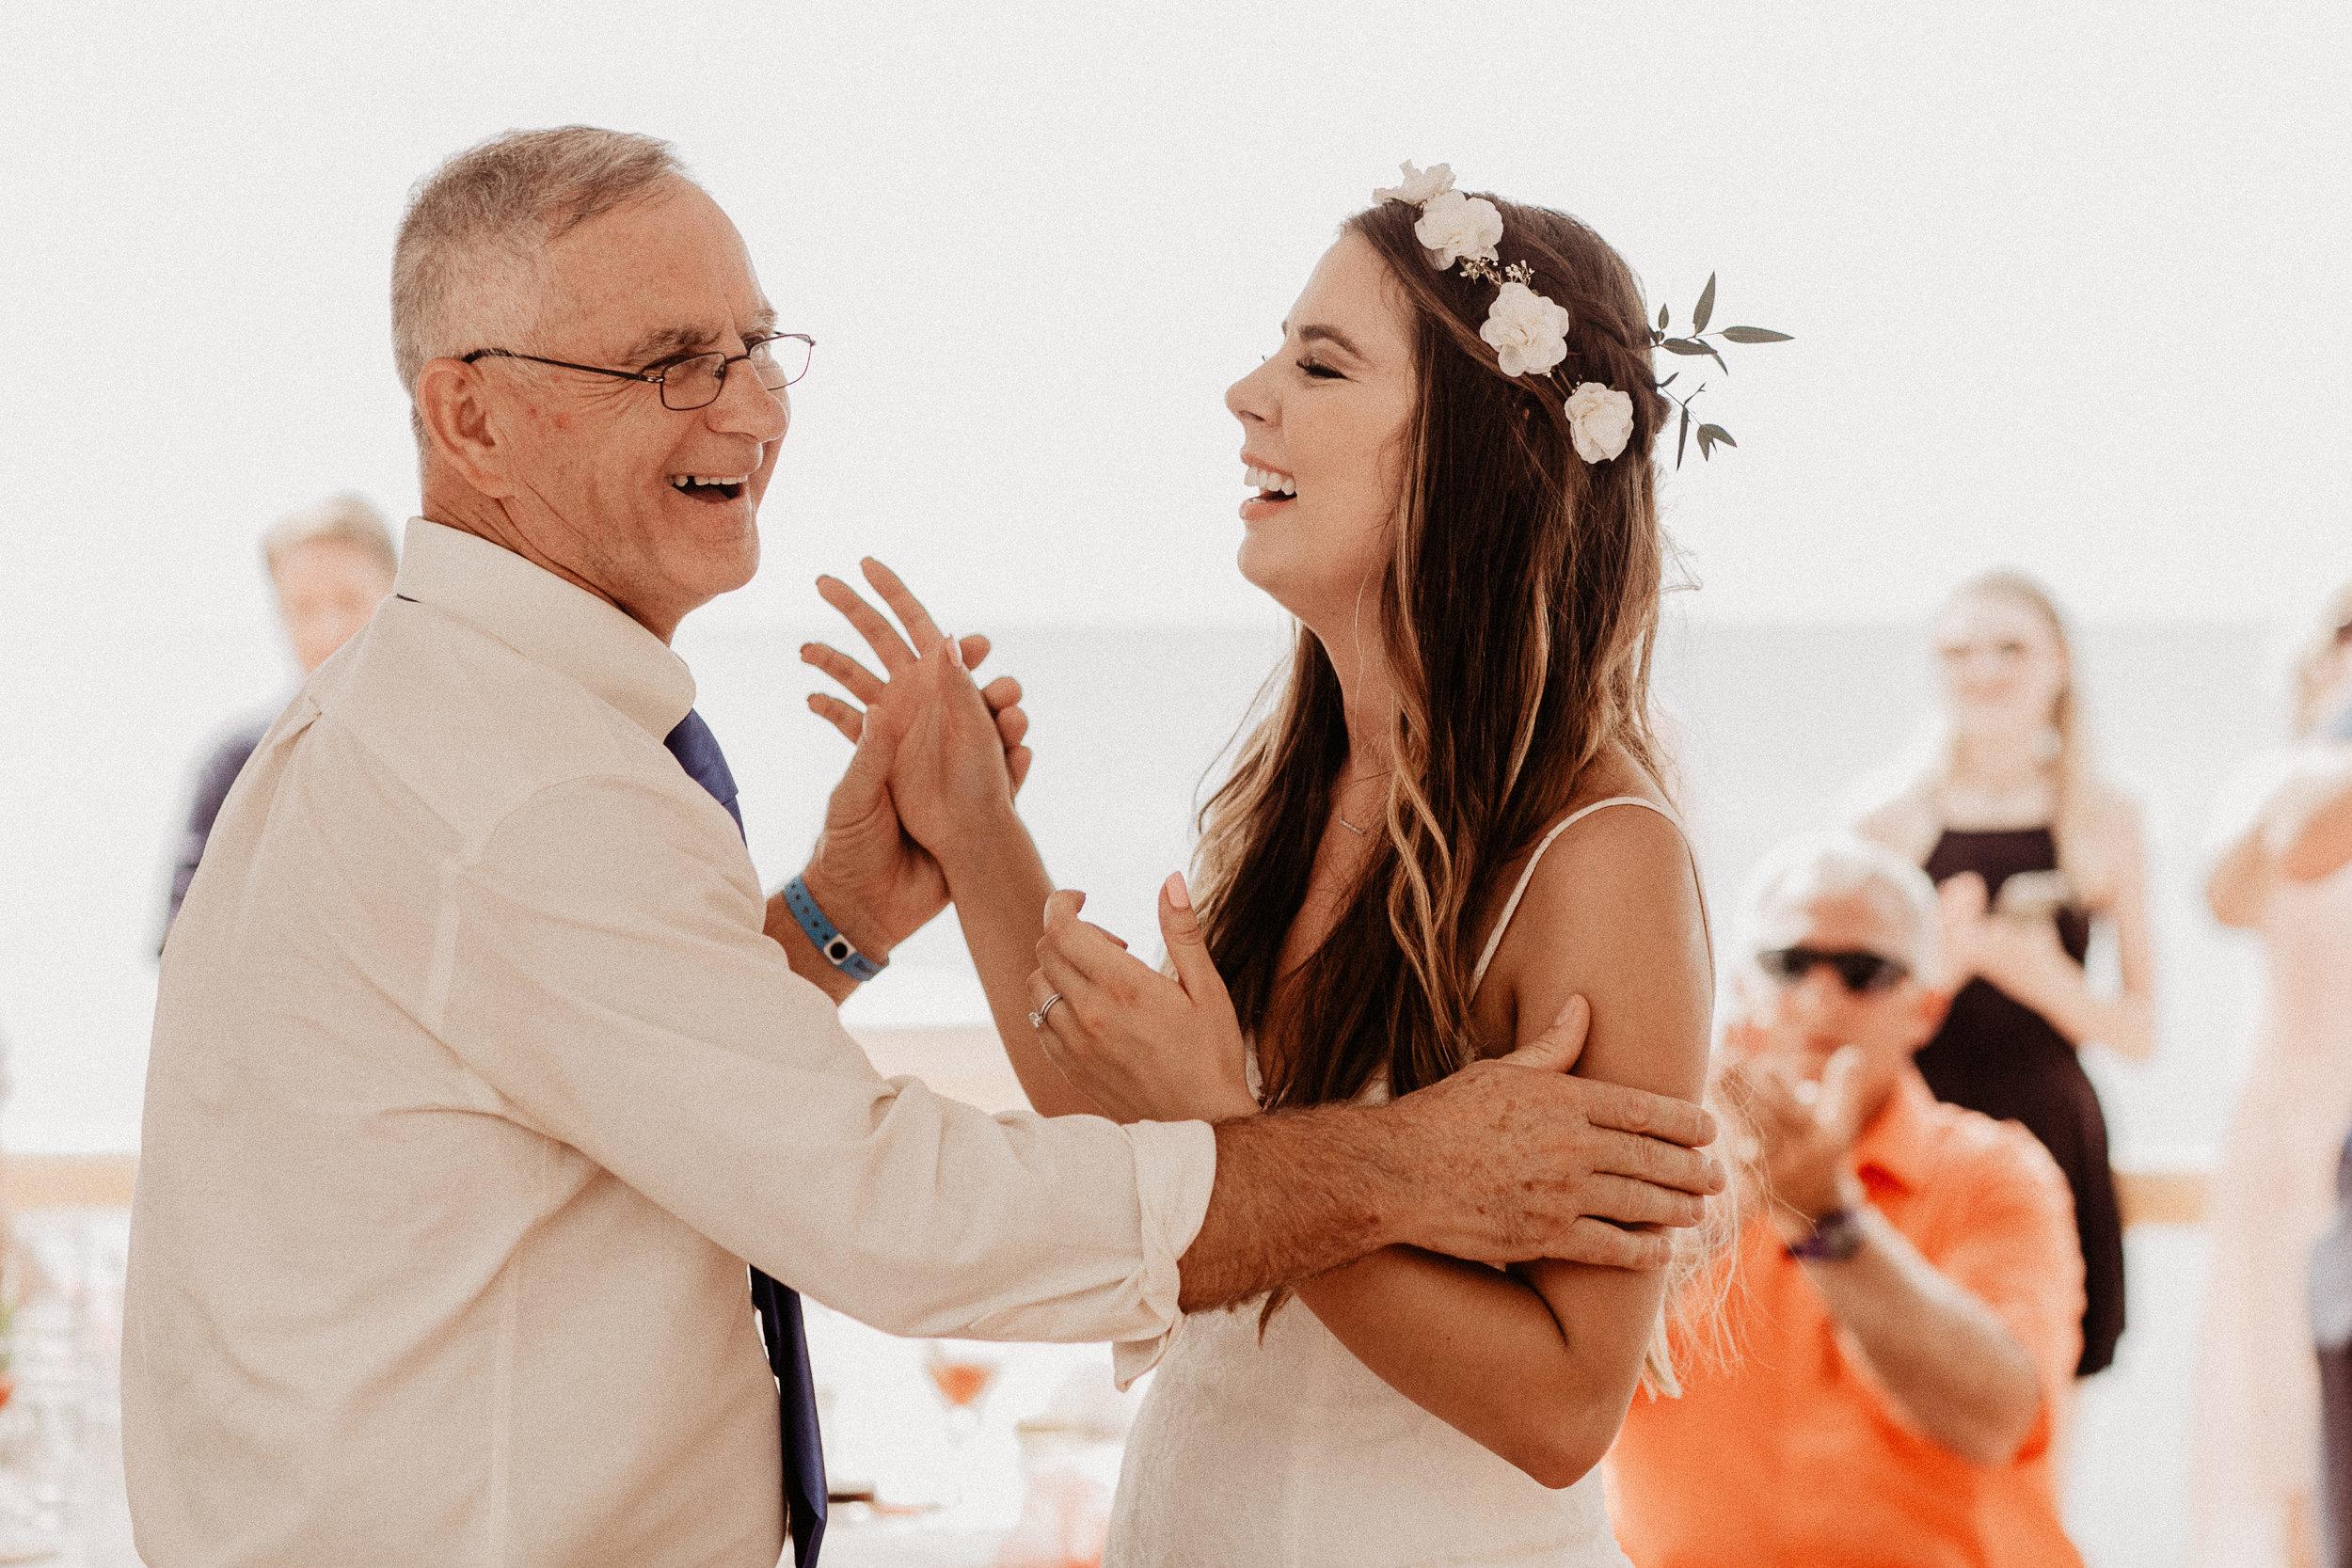 alfonso_flores_destination_wedding_photography_puerto_vallarta_hotel_barcelo_vallarta_cuttler_amela-481.JPG